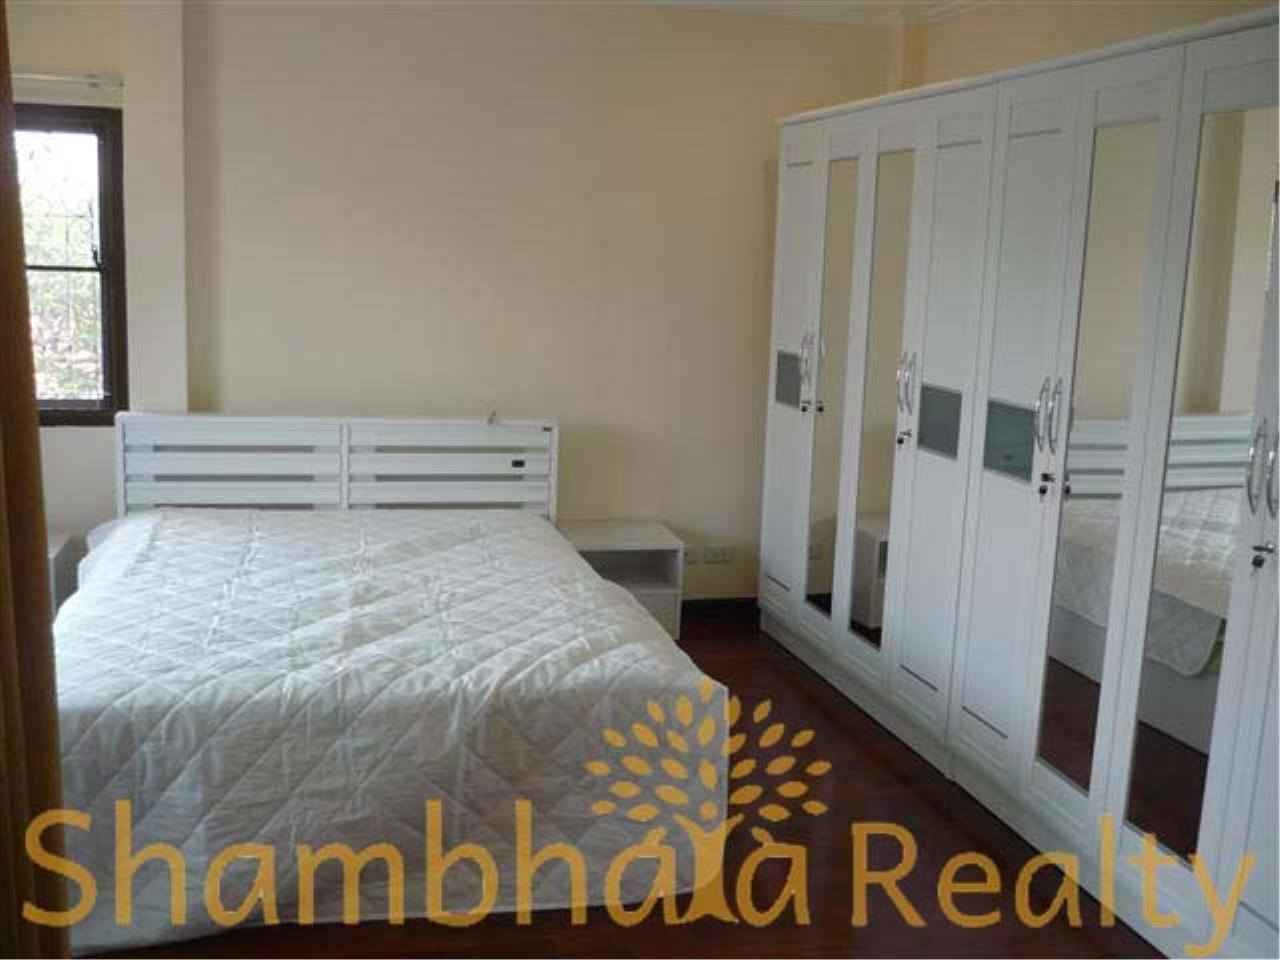 Shambhala Realty Agency's Single house to rent at Lassalle 22 Condominium for Rent in Sukhumvit Soi 101, Lassalle 22 6